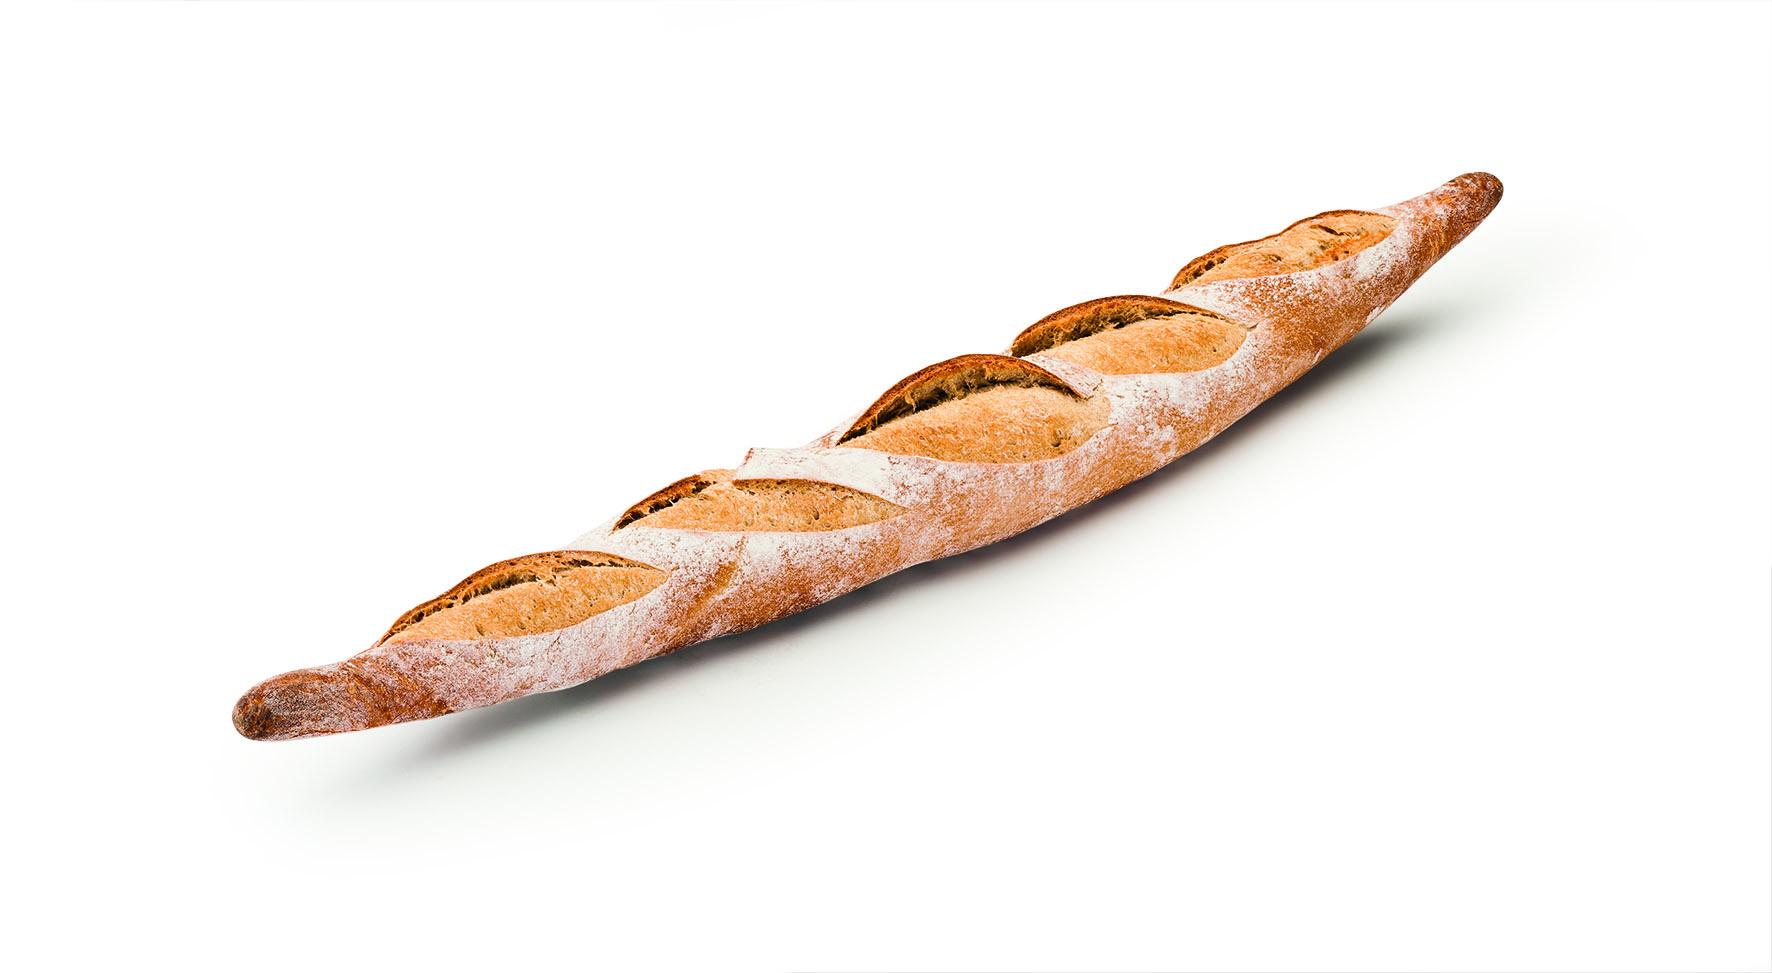 Fourniline baguette